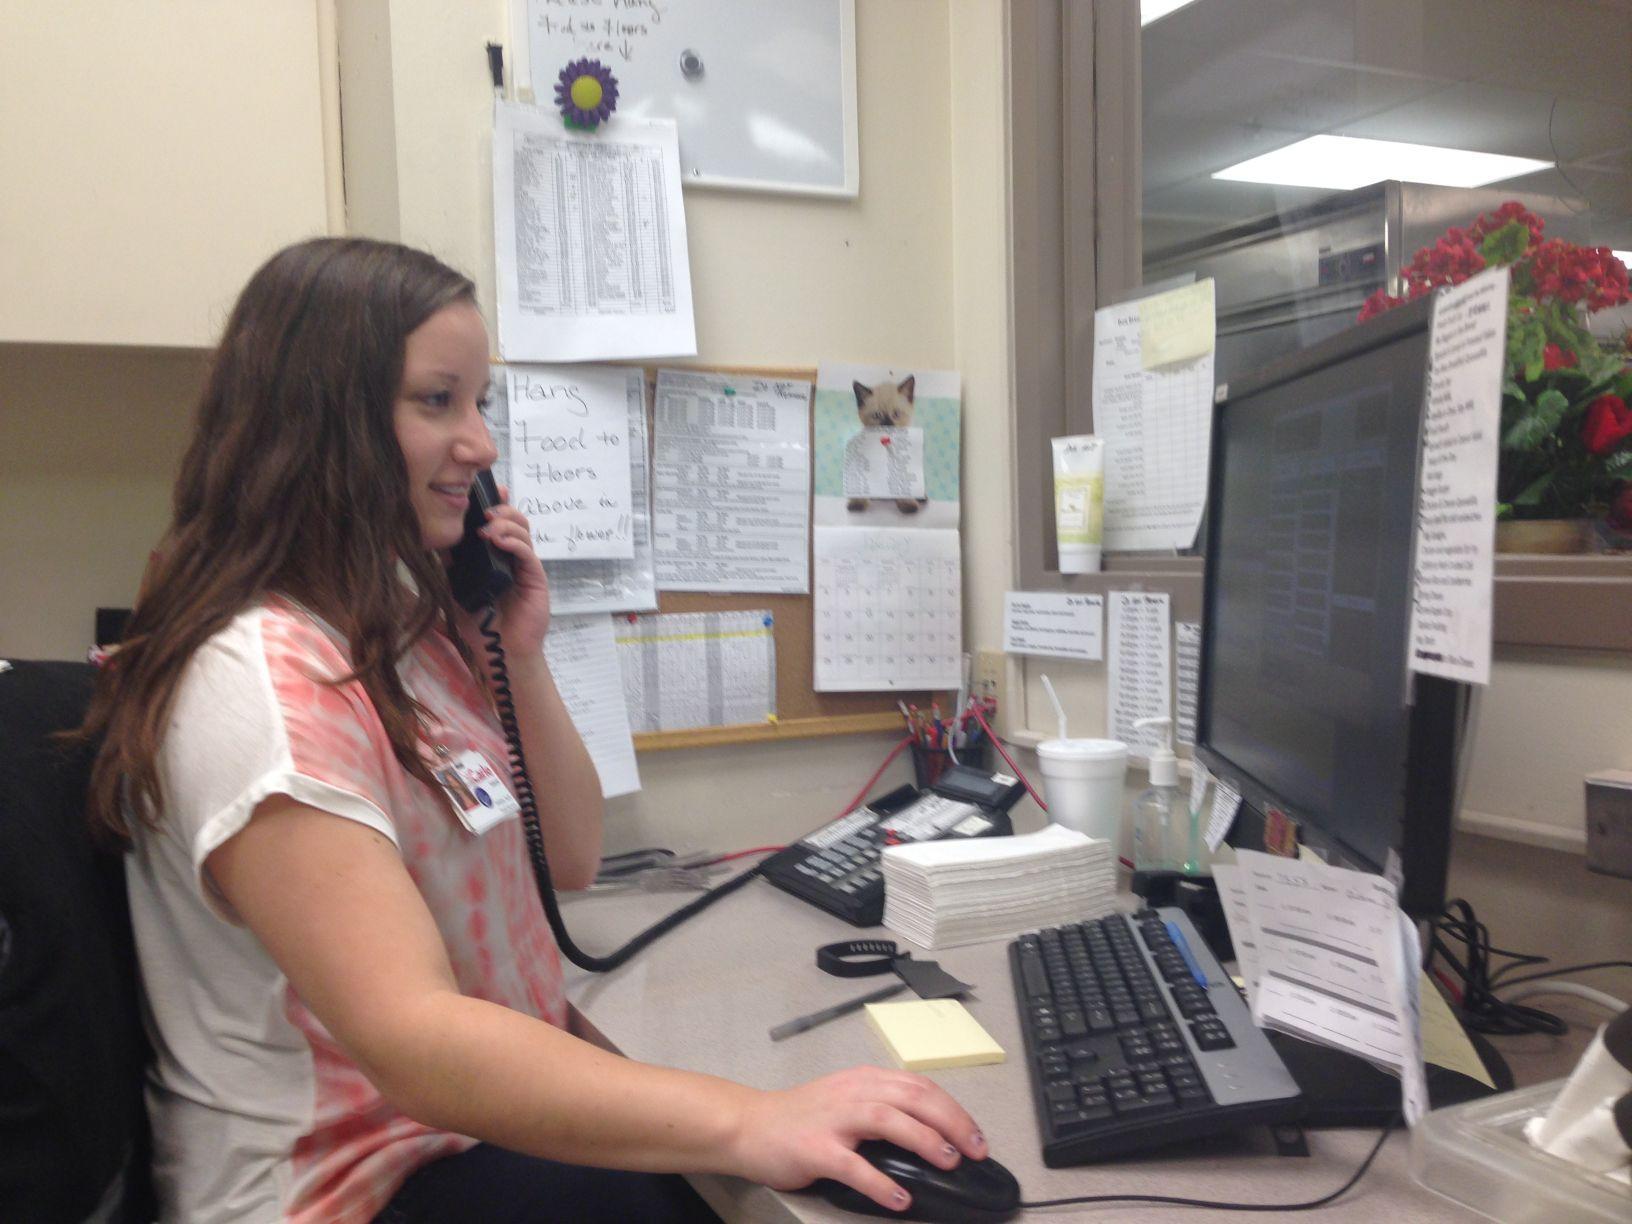 Laurel Jakubowski, senior in ACES, works at her job at Carle Foundation Hospital in Urbana, Illinois.